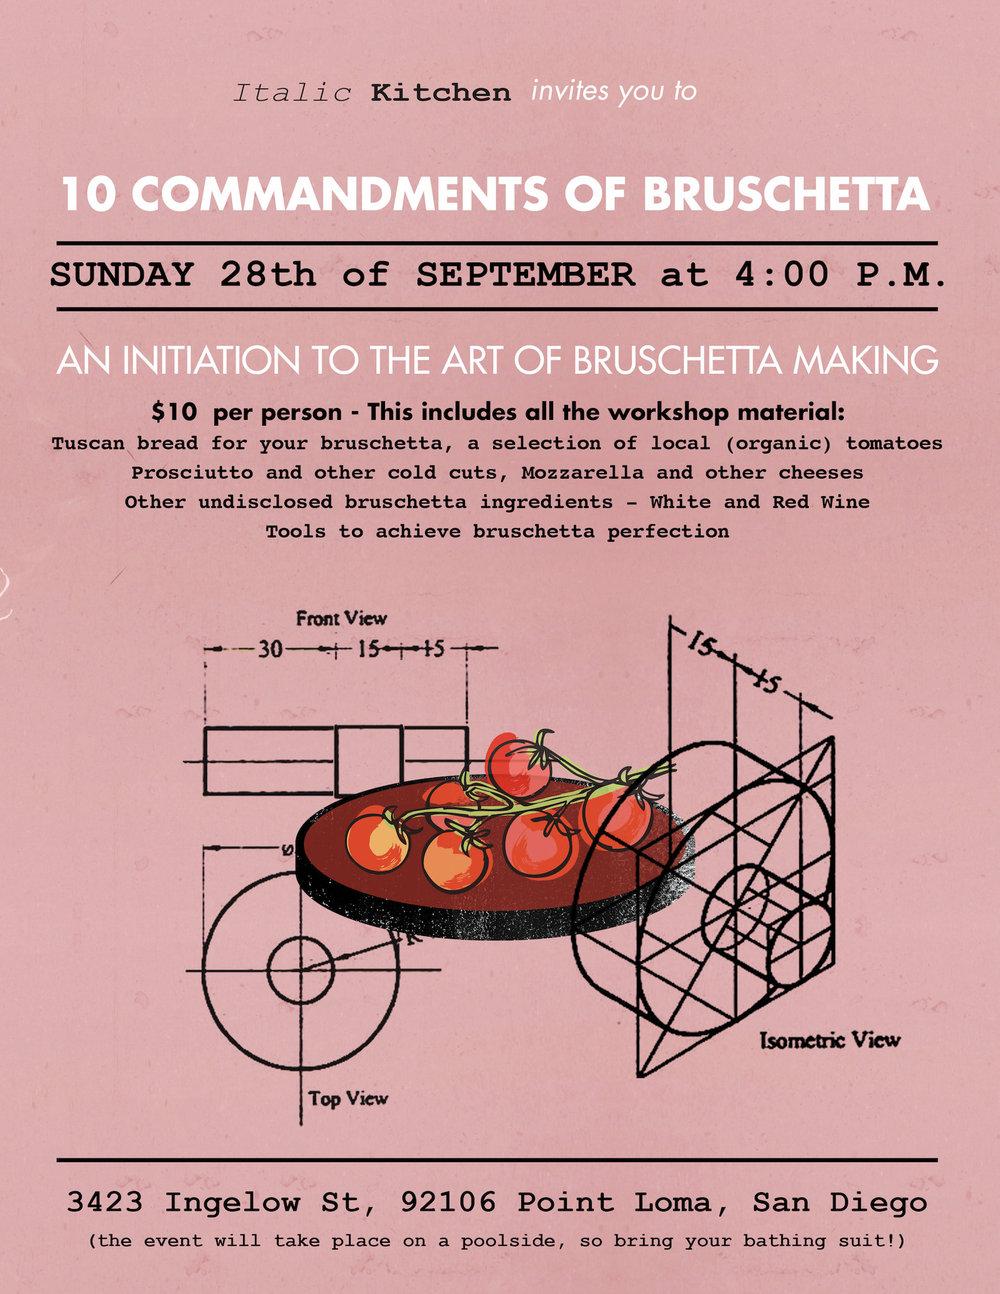 10 commandments of bruschetta.jpg